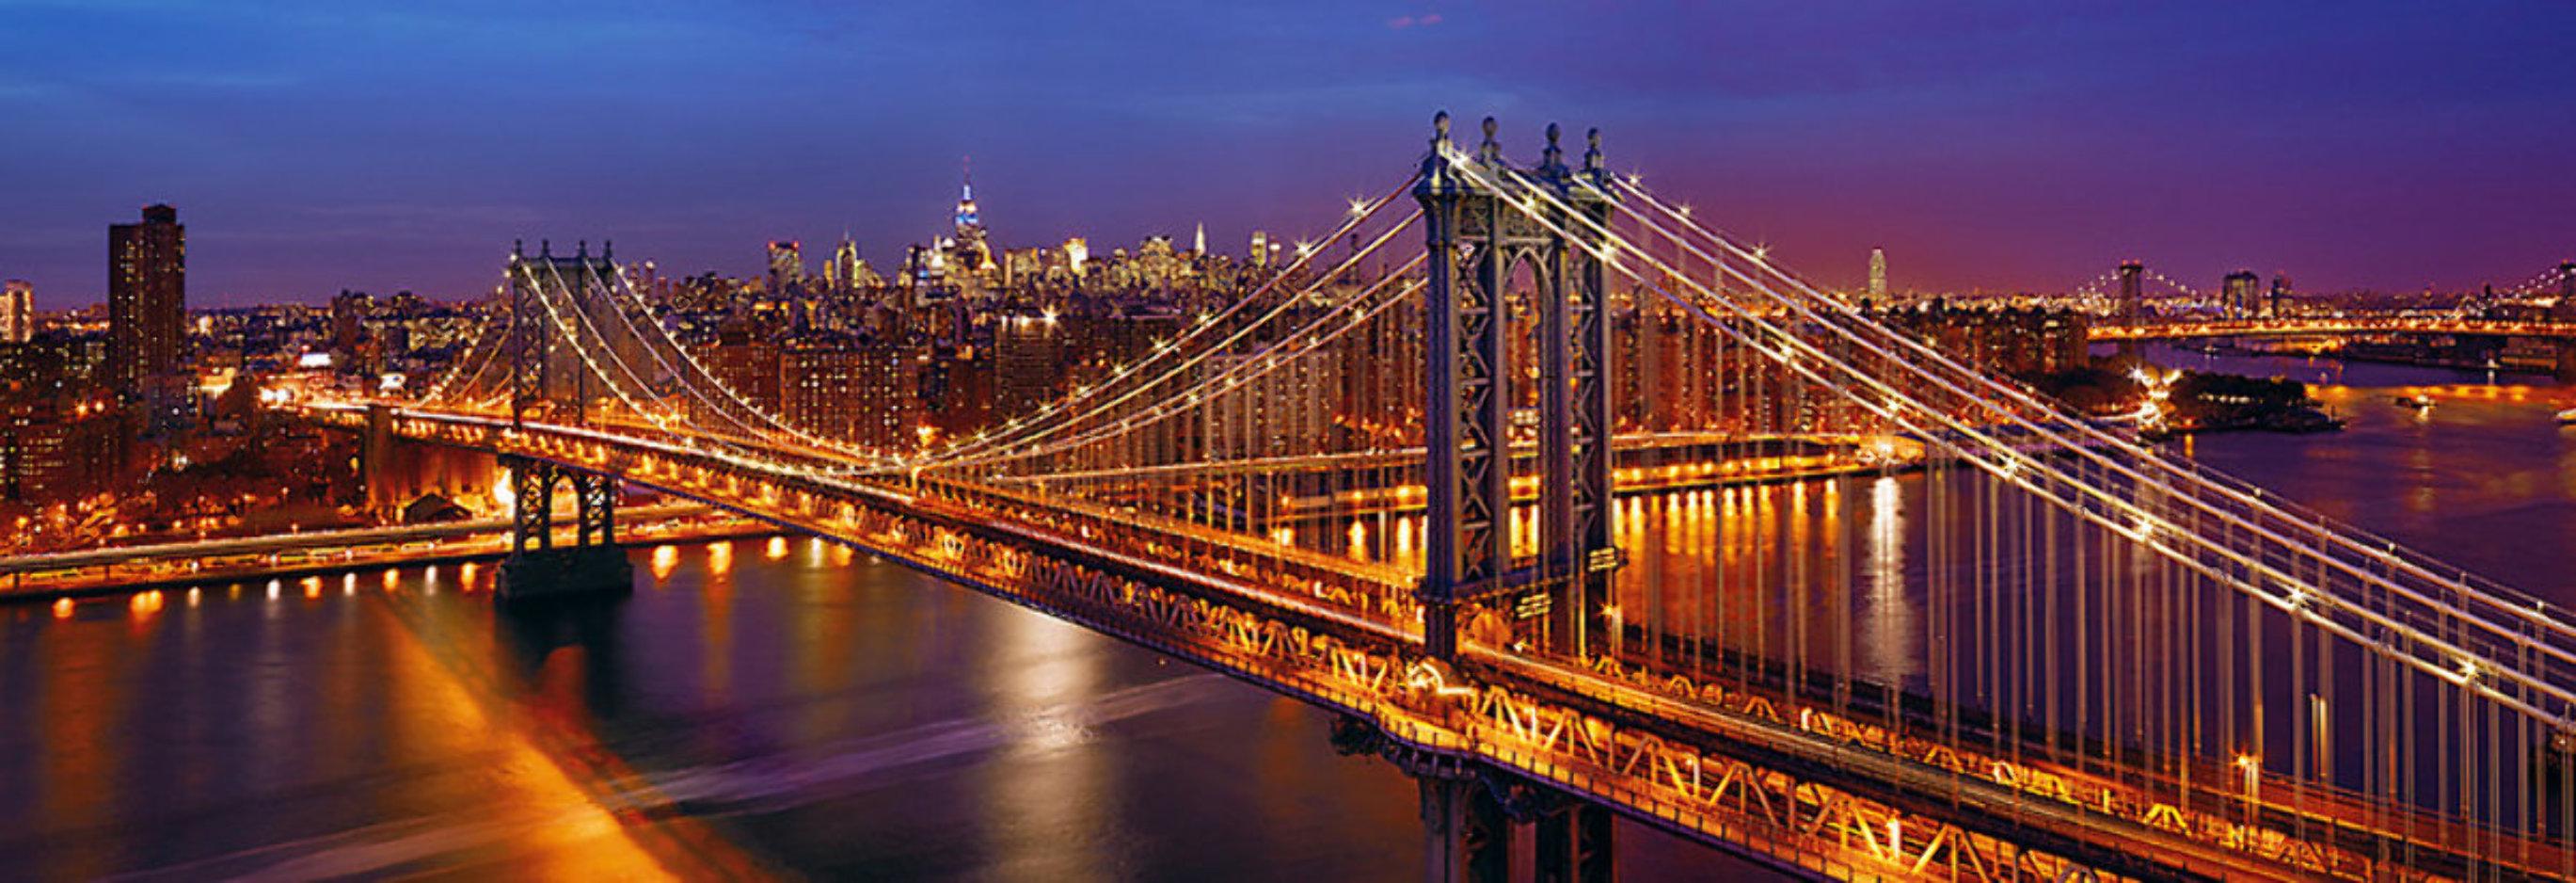 City (New York) 2M Super Huge Panorama by Peter Lik